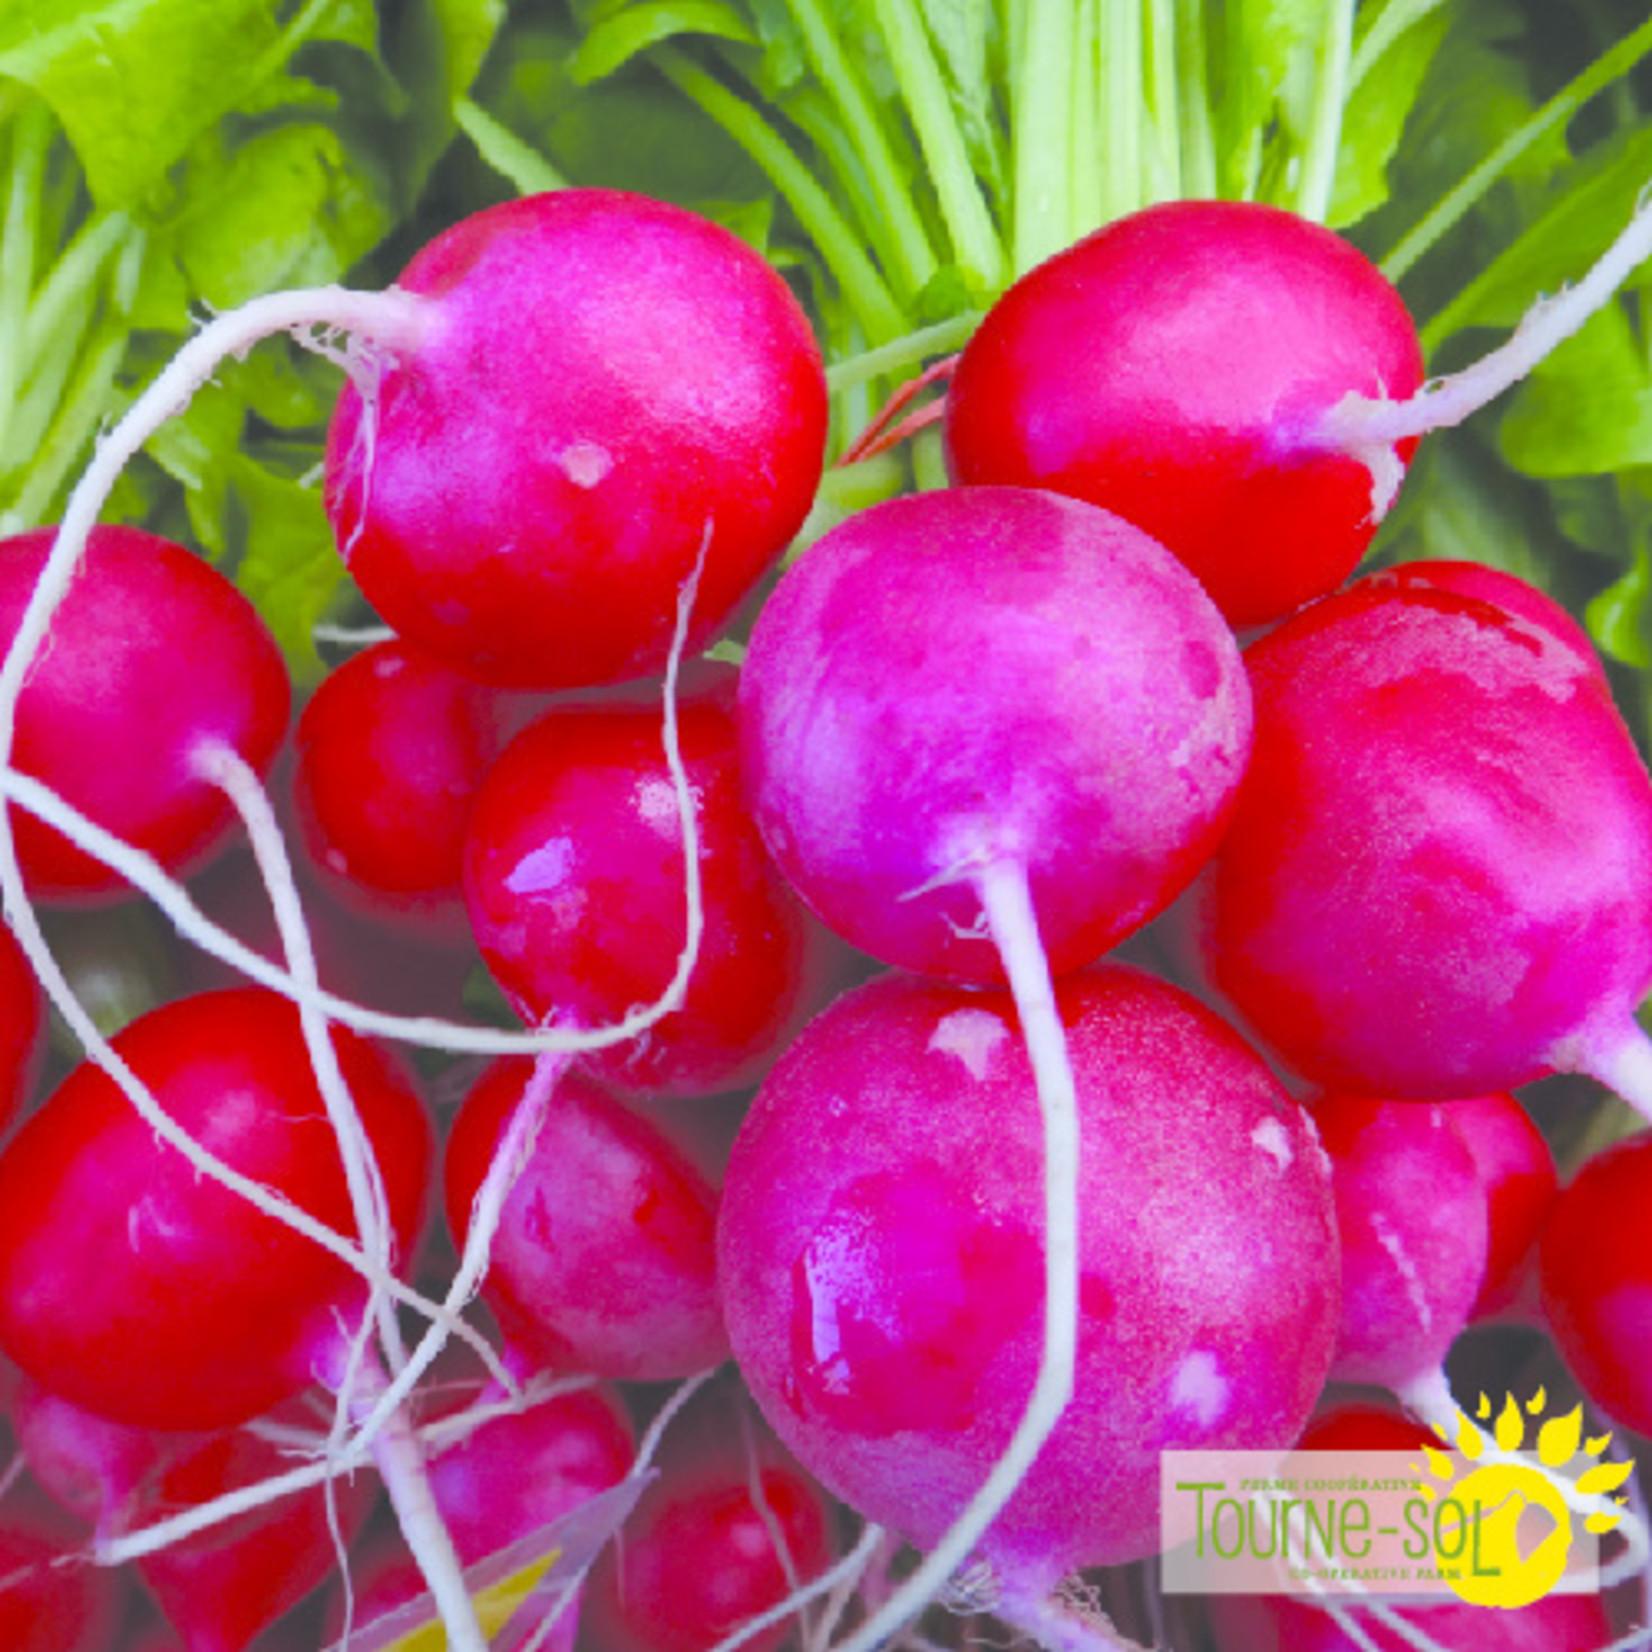 Tourne-Sol Raxe radish